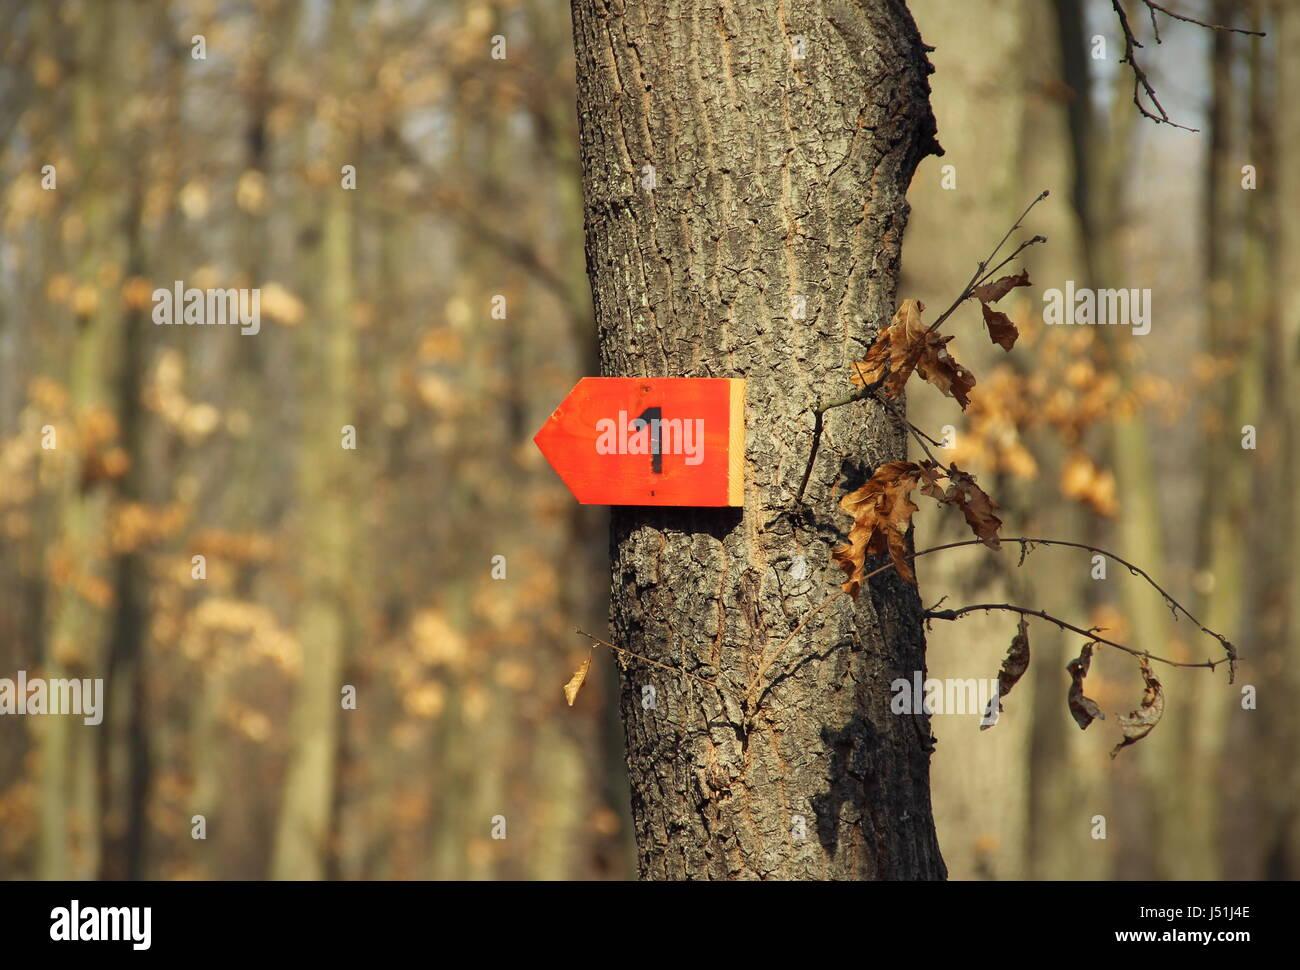 Arrow sign on tree - Stock Image